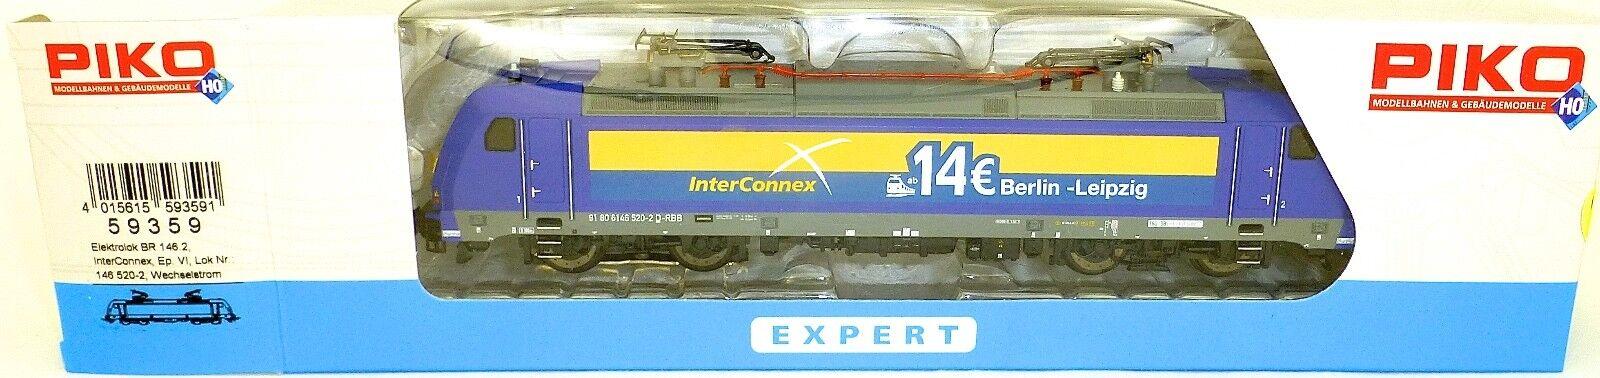 146 520 Interconnex Eléctrica para Märklin AC Epvi Piko 59359 H0 1 87